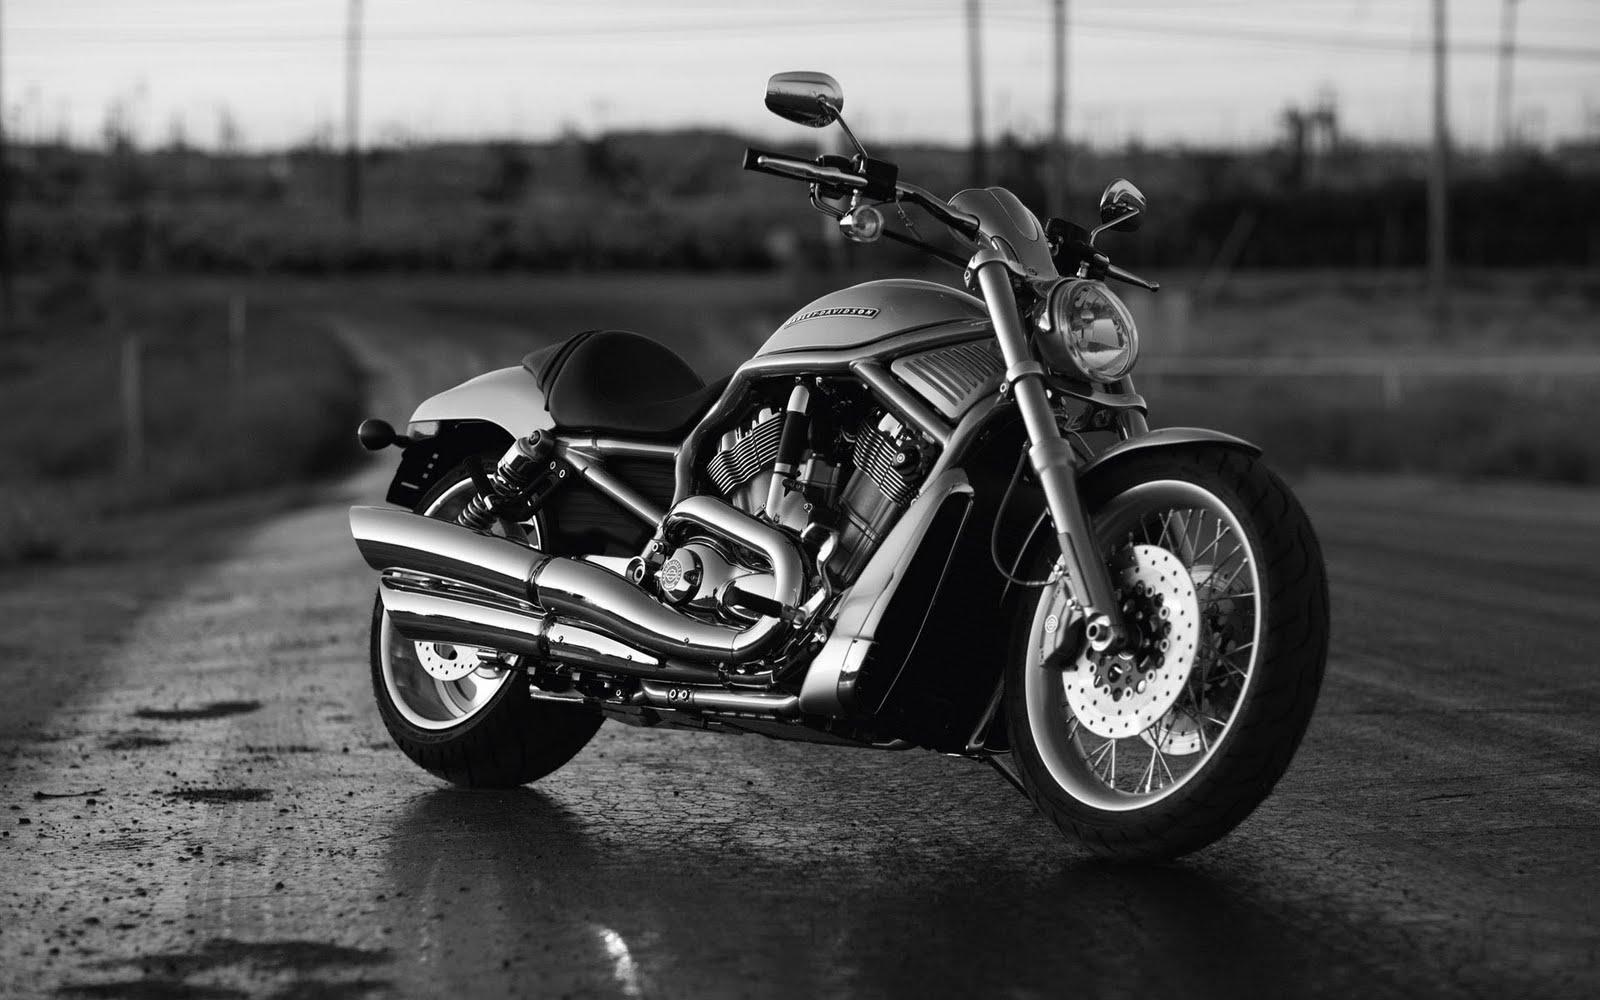 Best Desktop HD Wallpaper - Harley Davidson Wallpaper